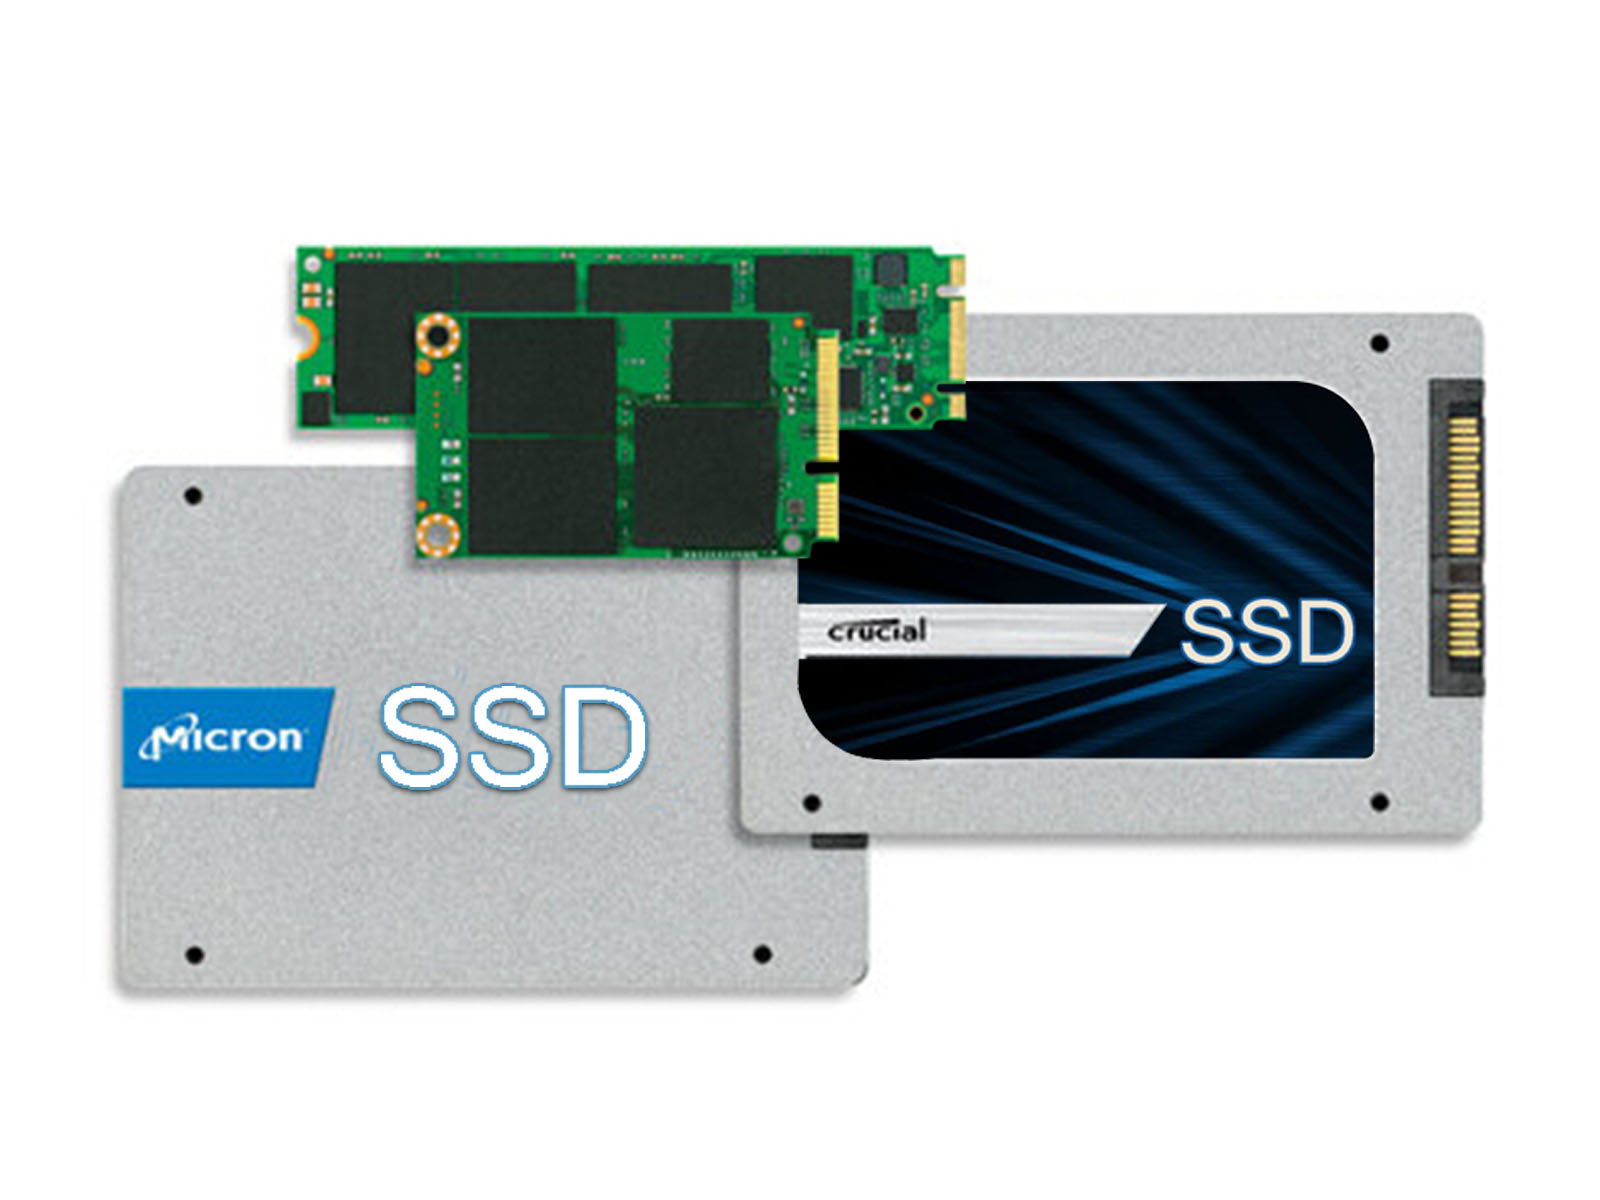 Micron / Crucial SSD